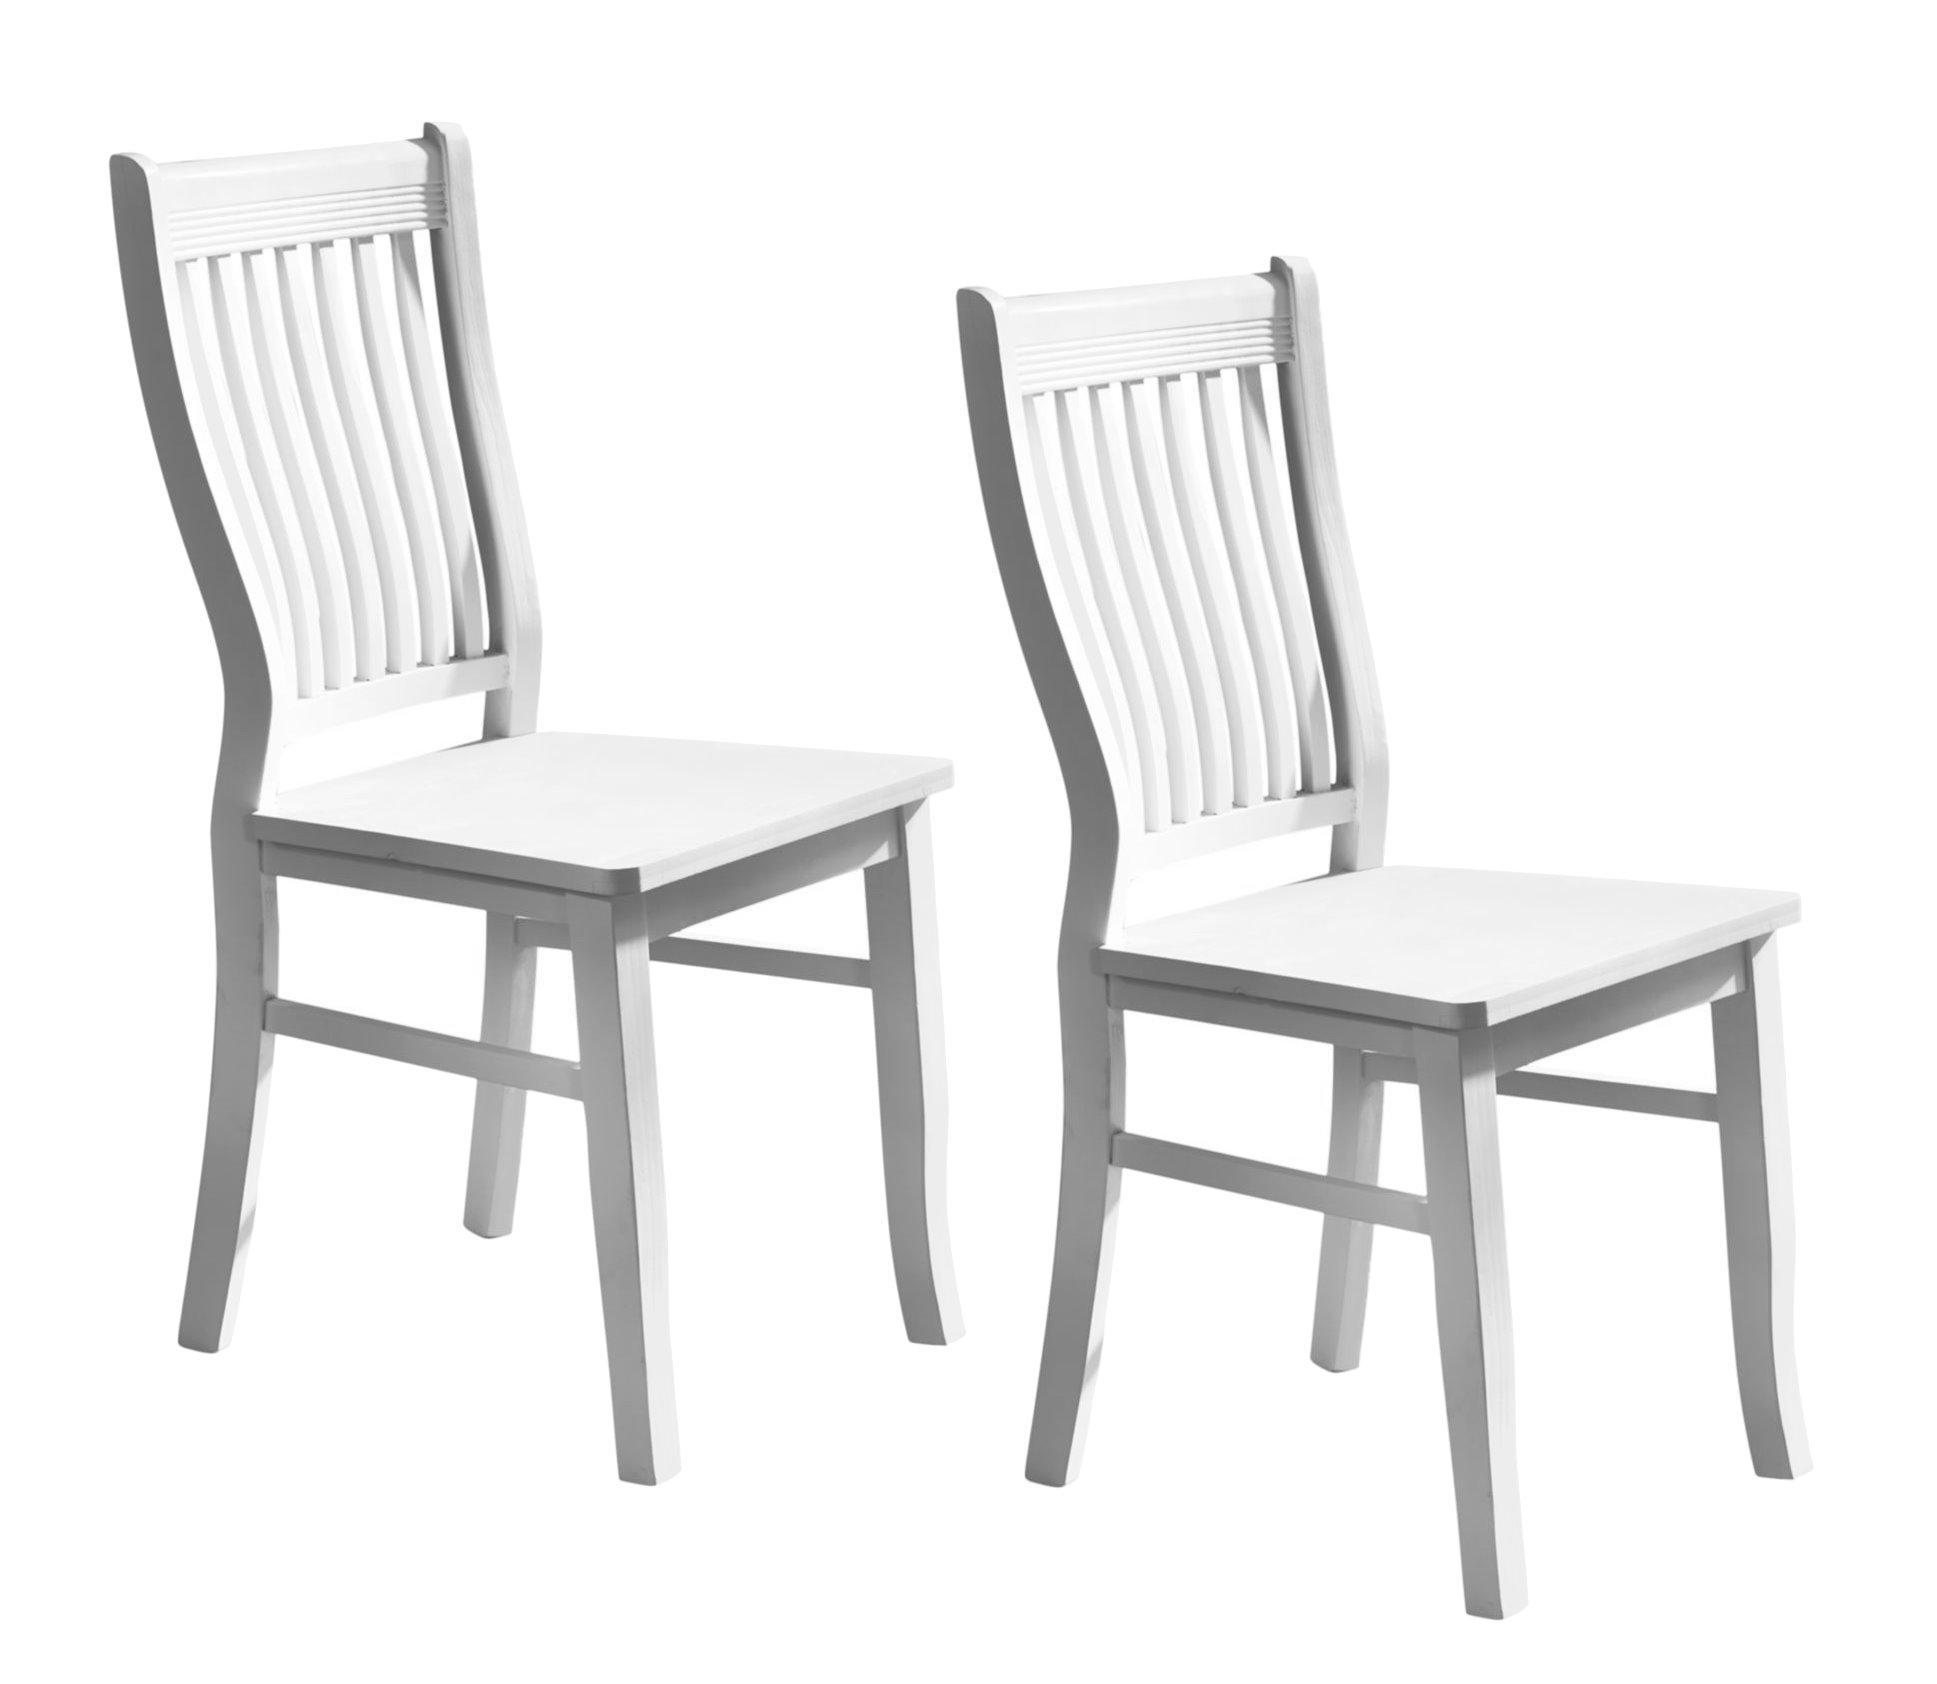 2x esszimmerstuhl k chenstuhl holzstuhl massivholz esszimmer stuhl landhaus wei ebay. Black Bedroom Furniture Sets. Home Design Ideas